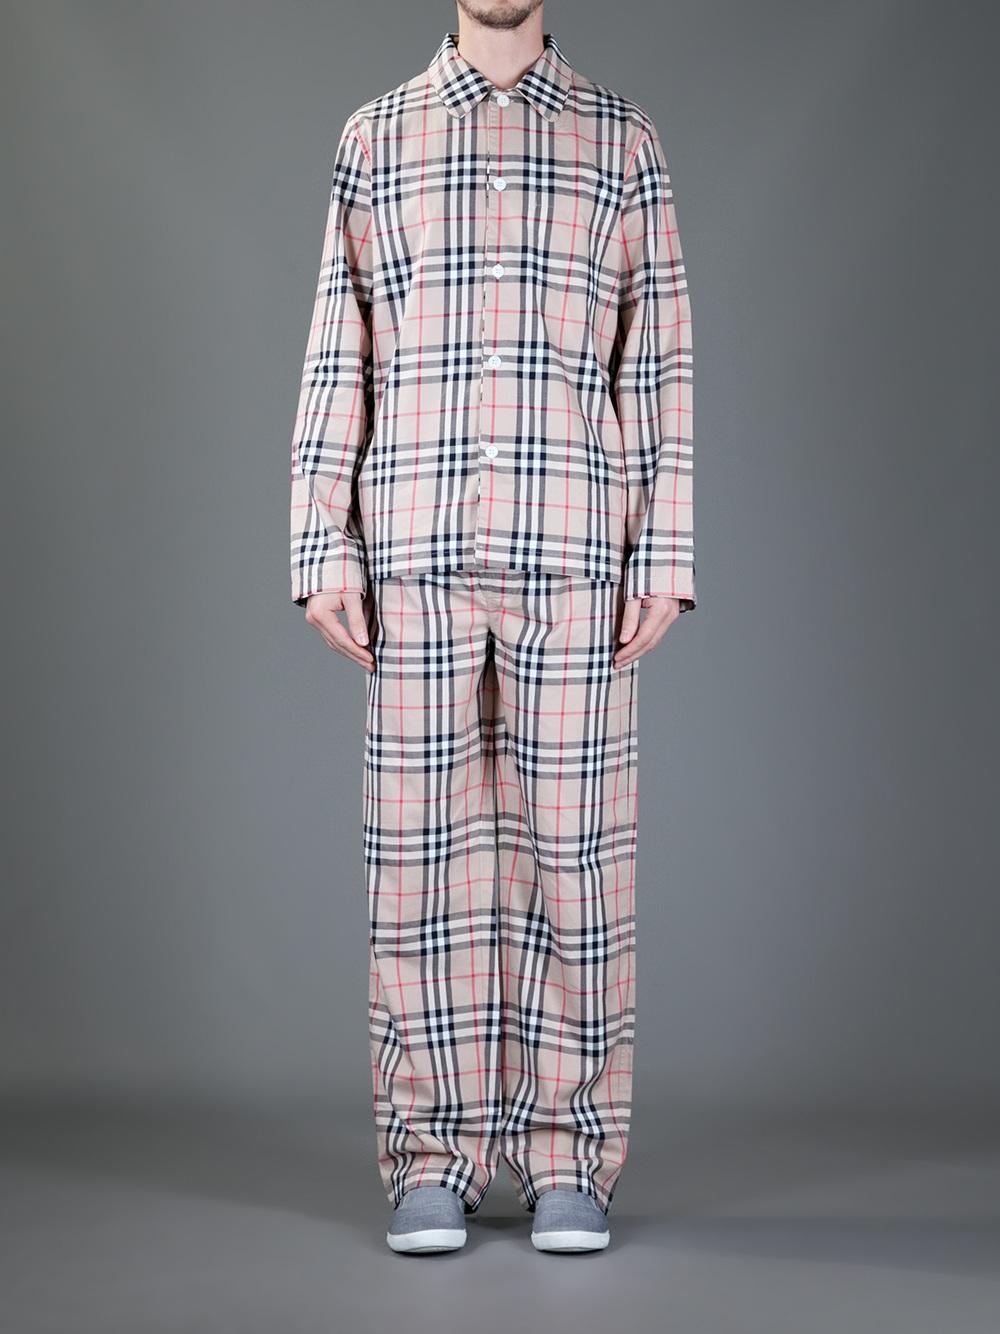 Mens Burberry Nightwear   Lyst™